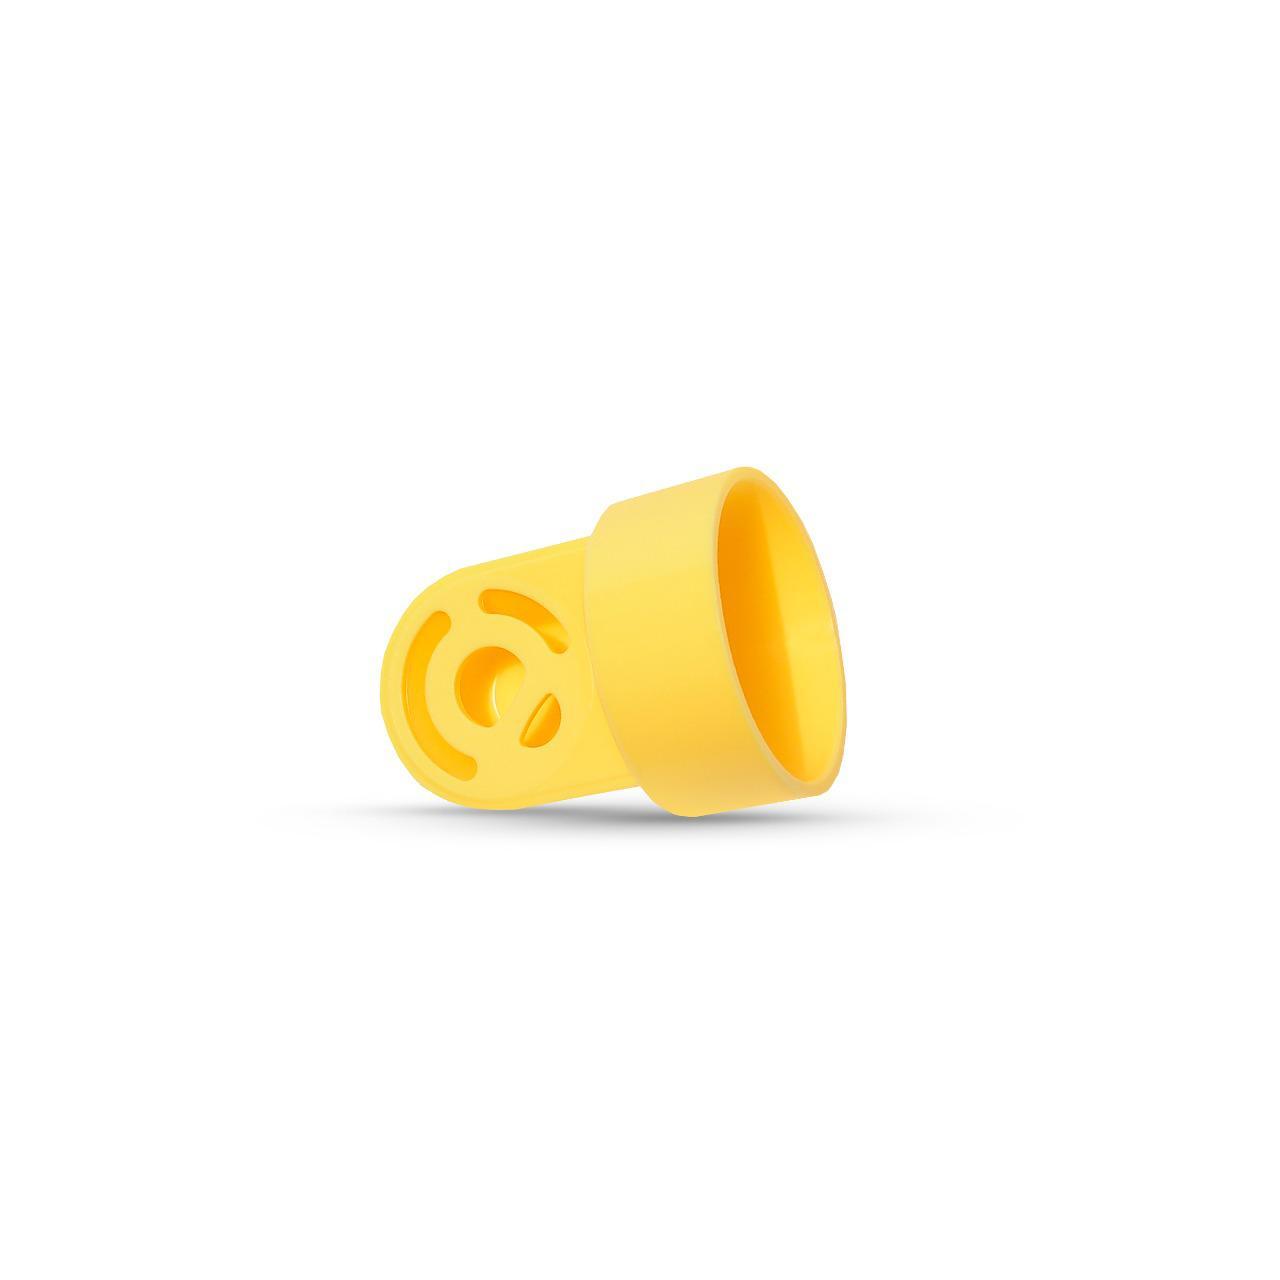 medela-valvula-amarela-